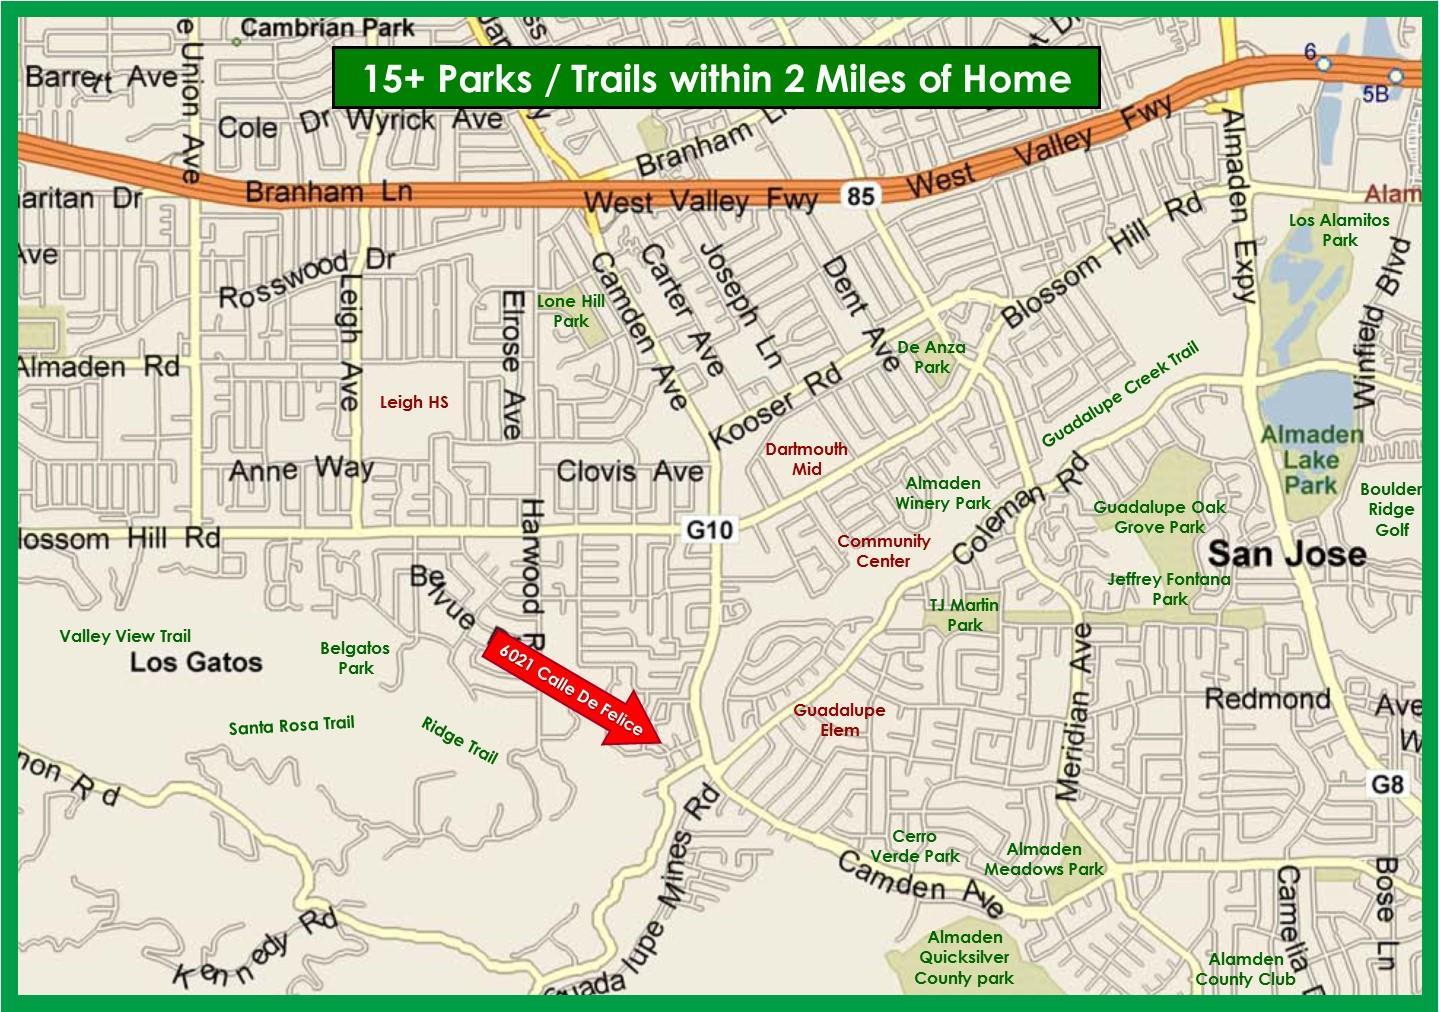 6021 Calle De Felice, San Jose, 95124 - SOLD LISTING, MLS ...